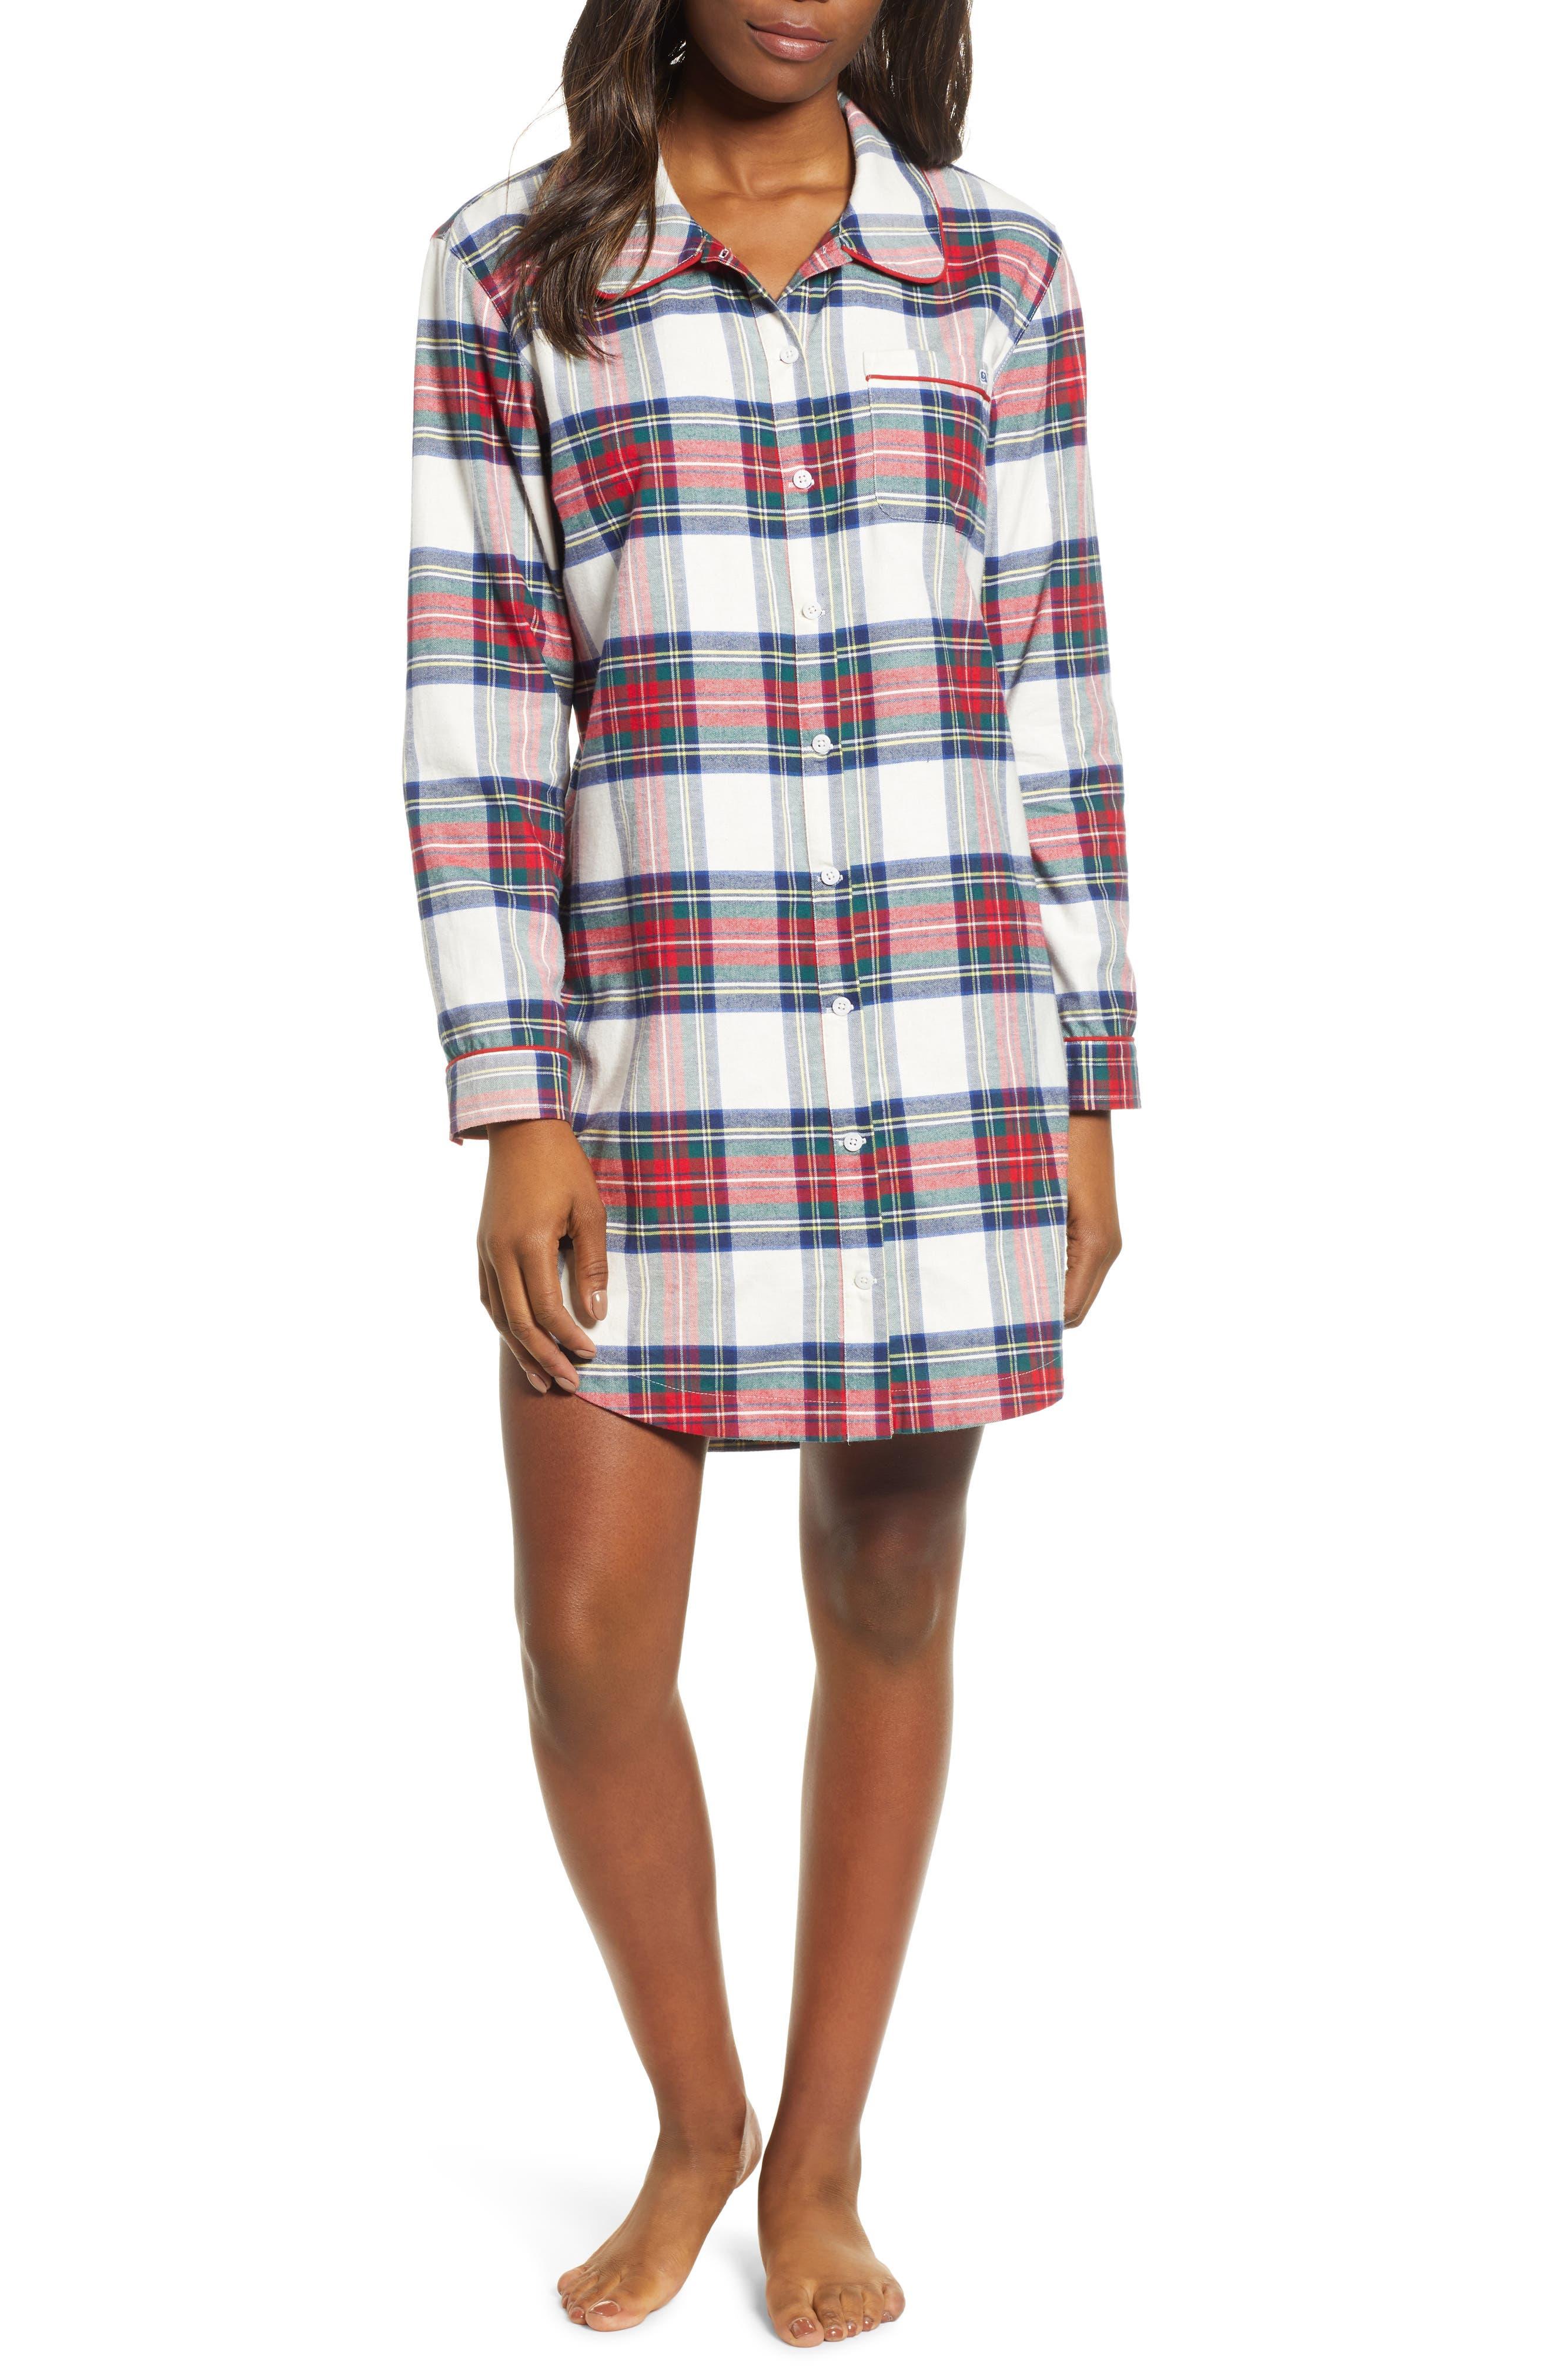 Vineyard Vines Jolly Plaid Flannel Pajama Shirt, Ivory